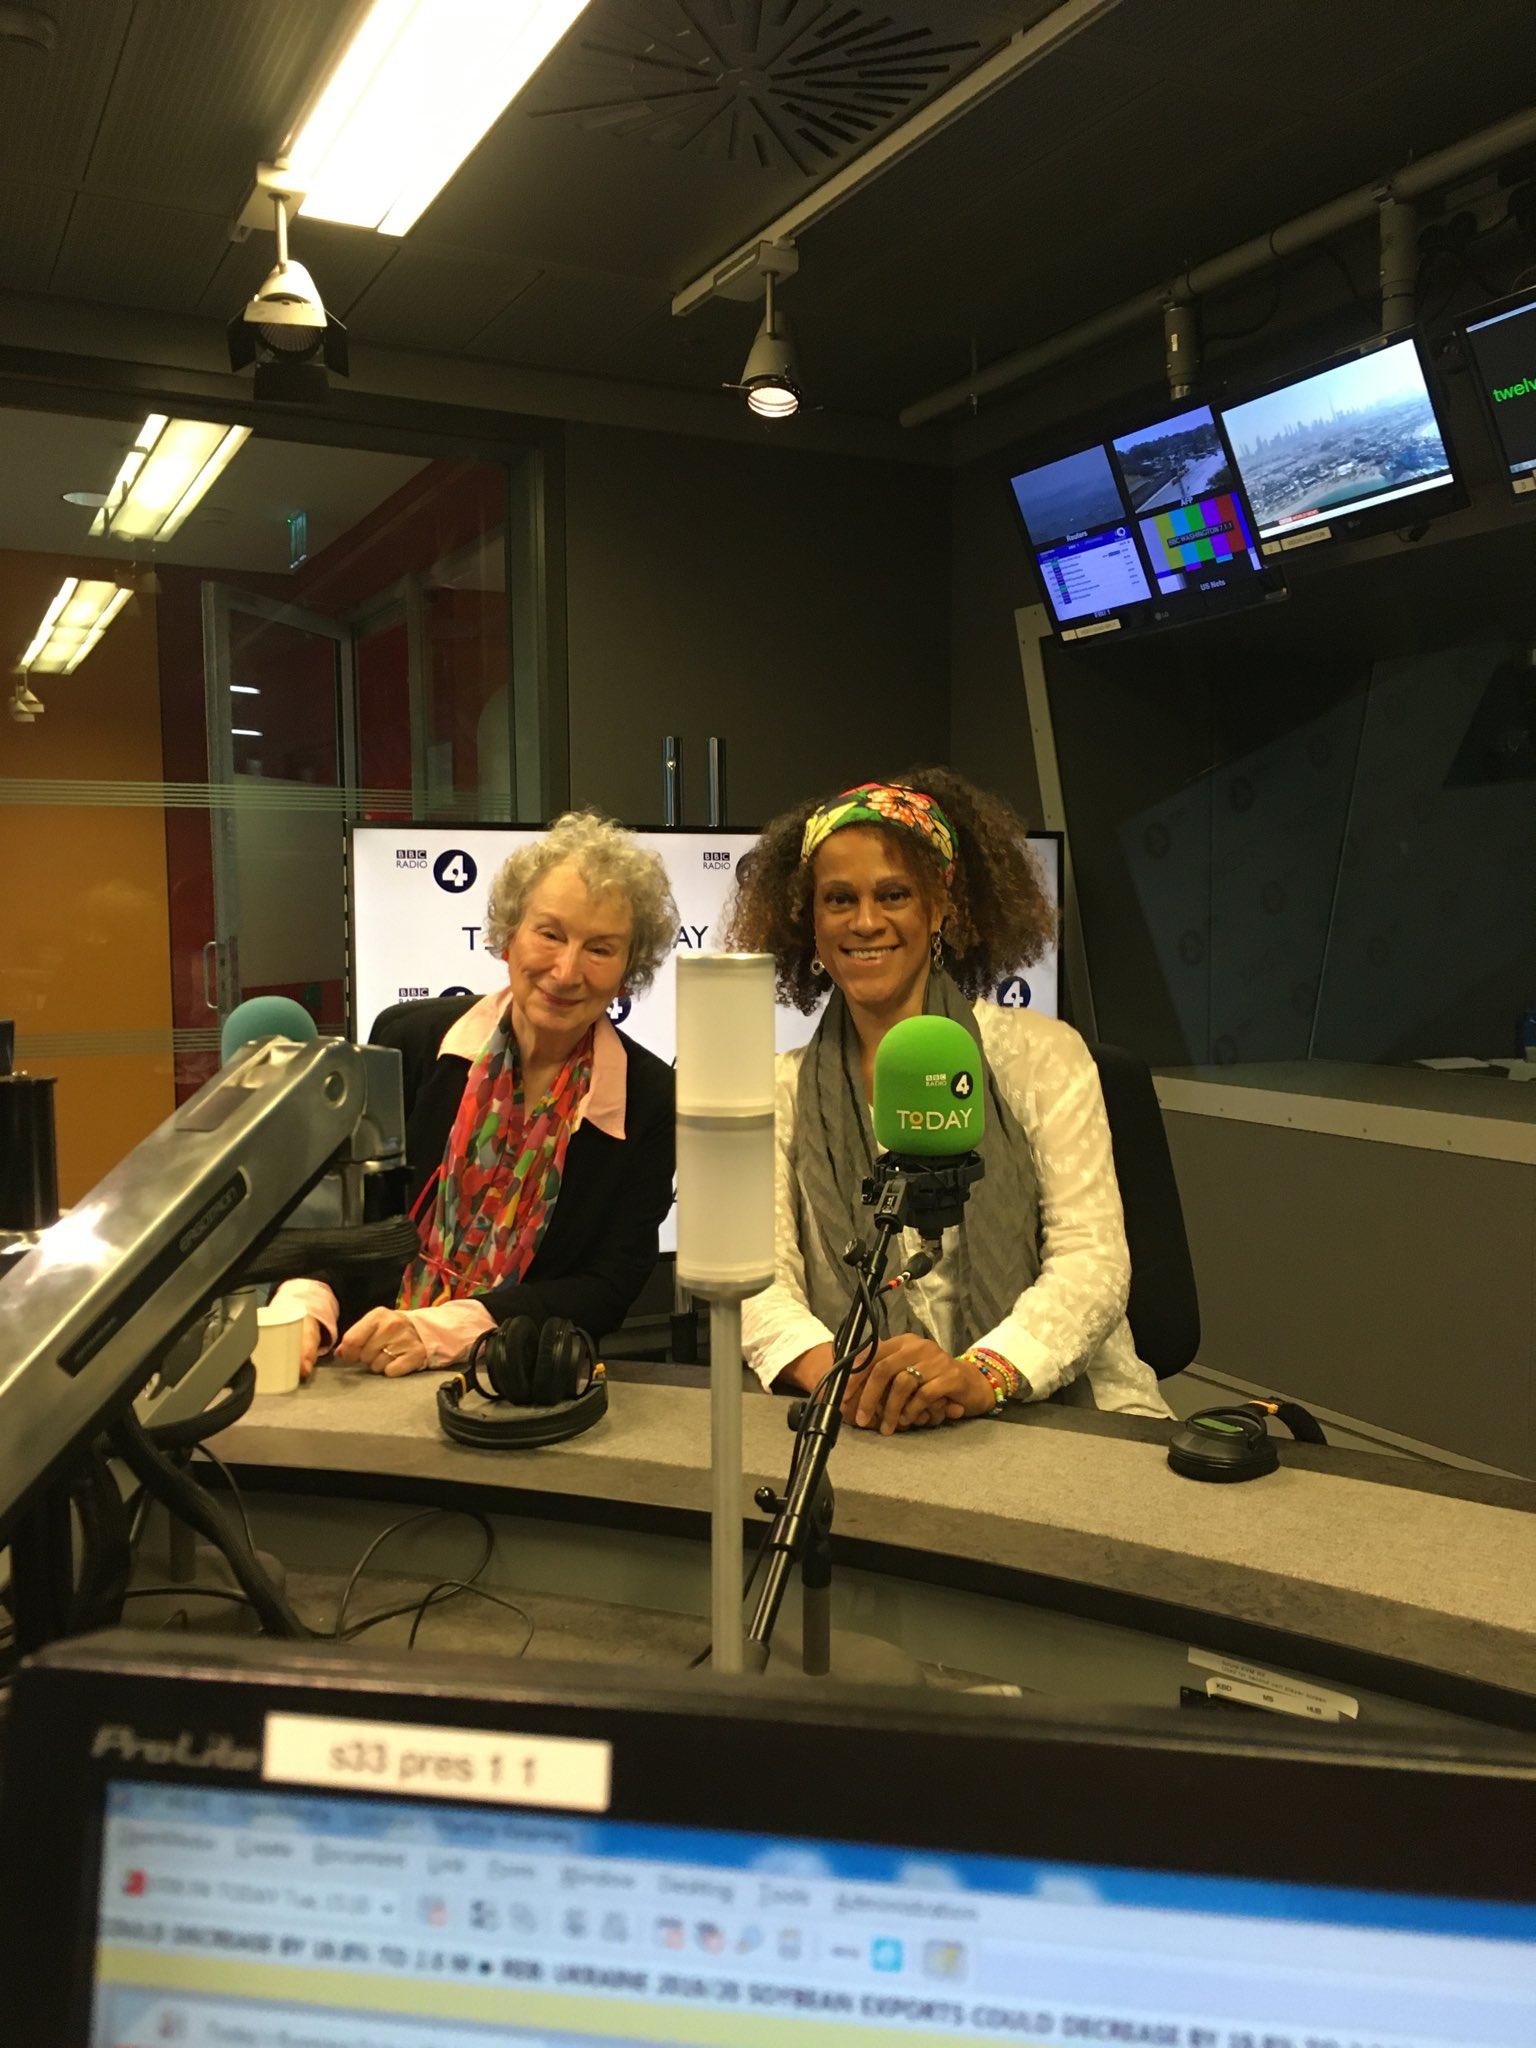 Wonderful to celebrate with the TWO winners of @TheBookerPrizes - @MargaretAtwood and @BernardineEvari @BBCr4today https://t.co/fPy6cFqIjU